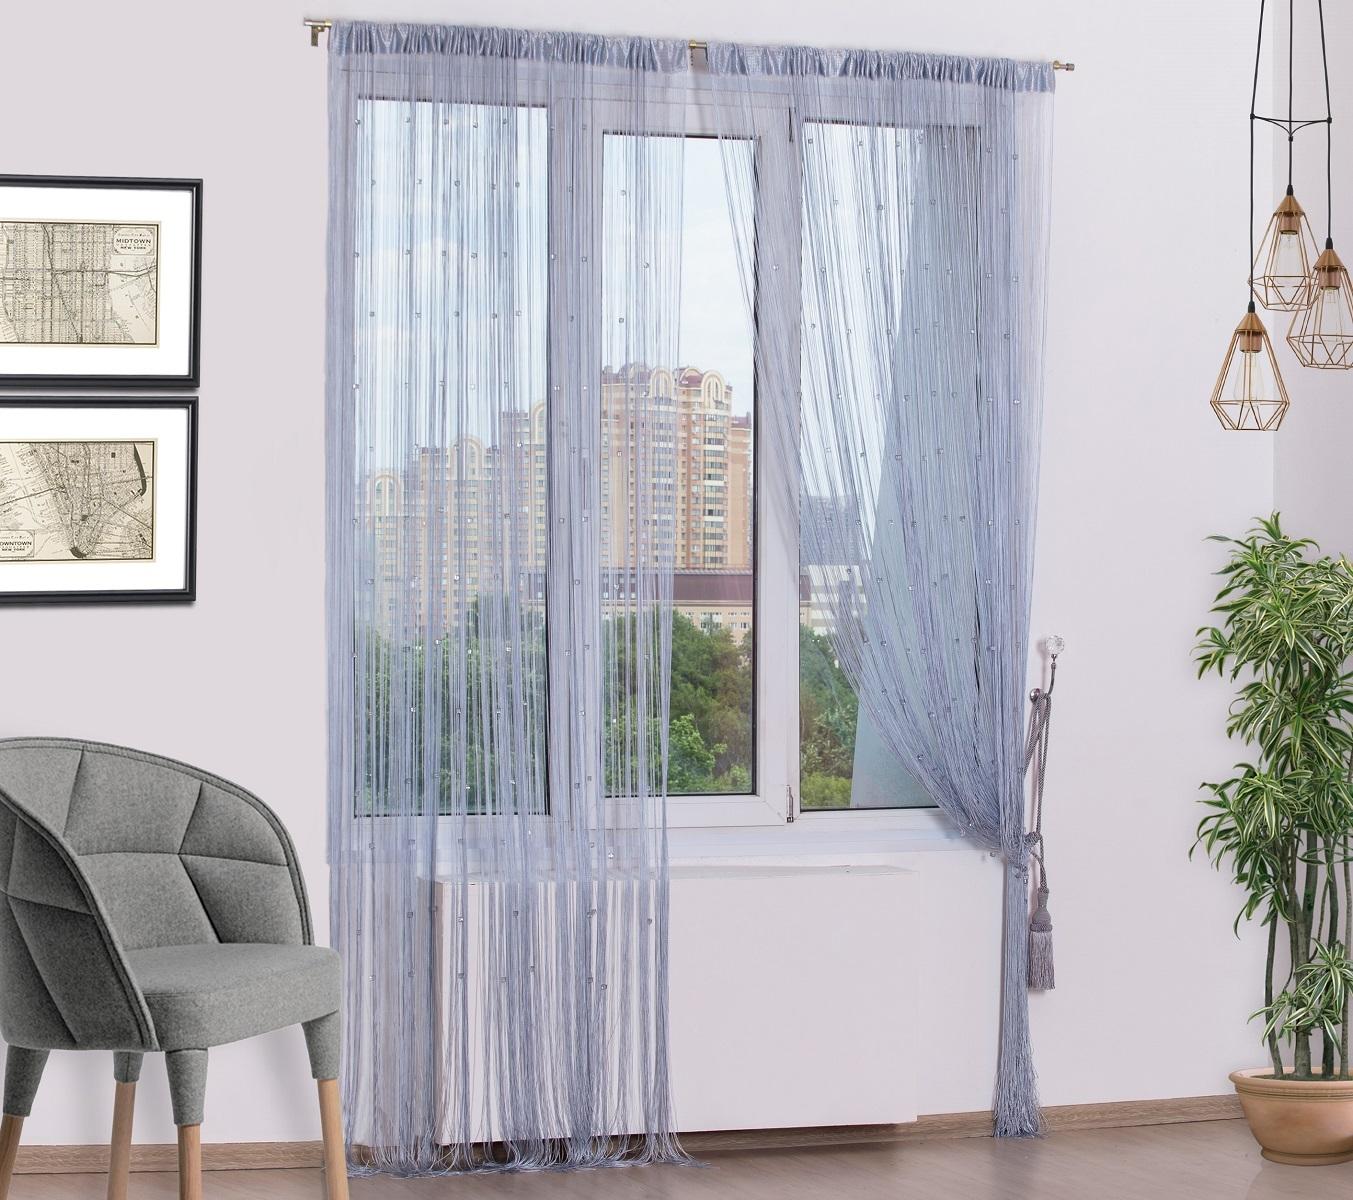 Занавеска нитяная ШТОРЫ стеклярус 290х300см, светло-серый